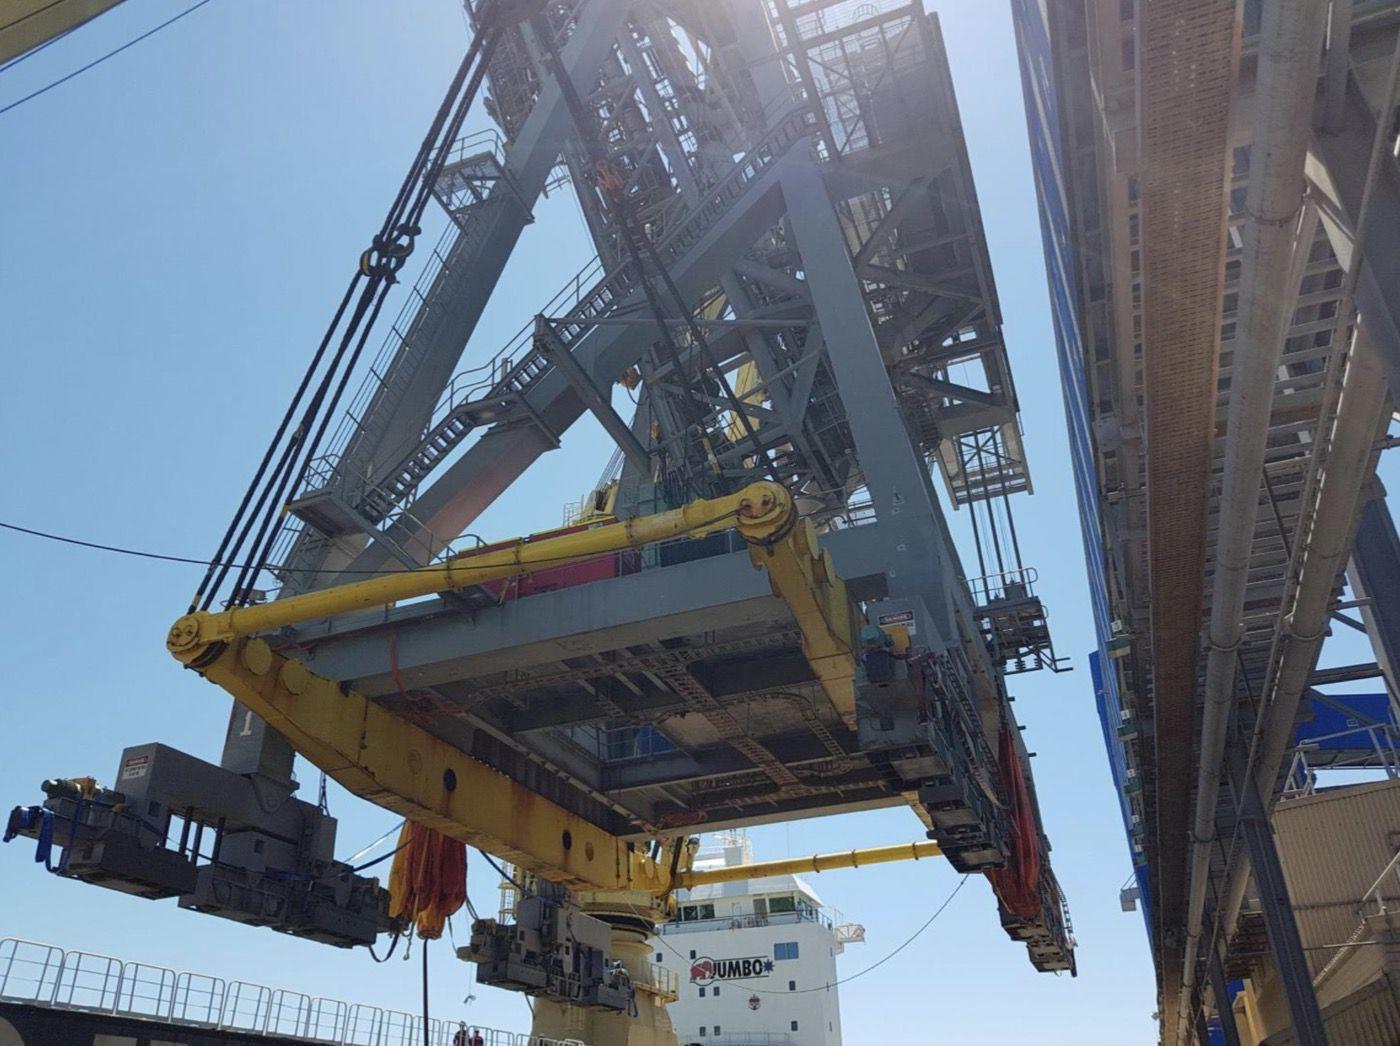 5-fremantle-port-crane-removal@2x